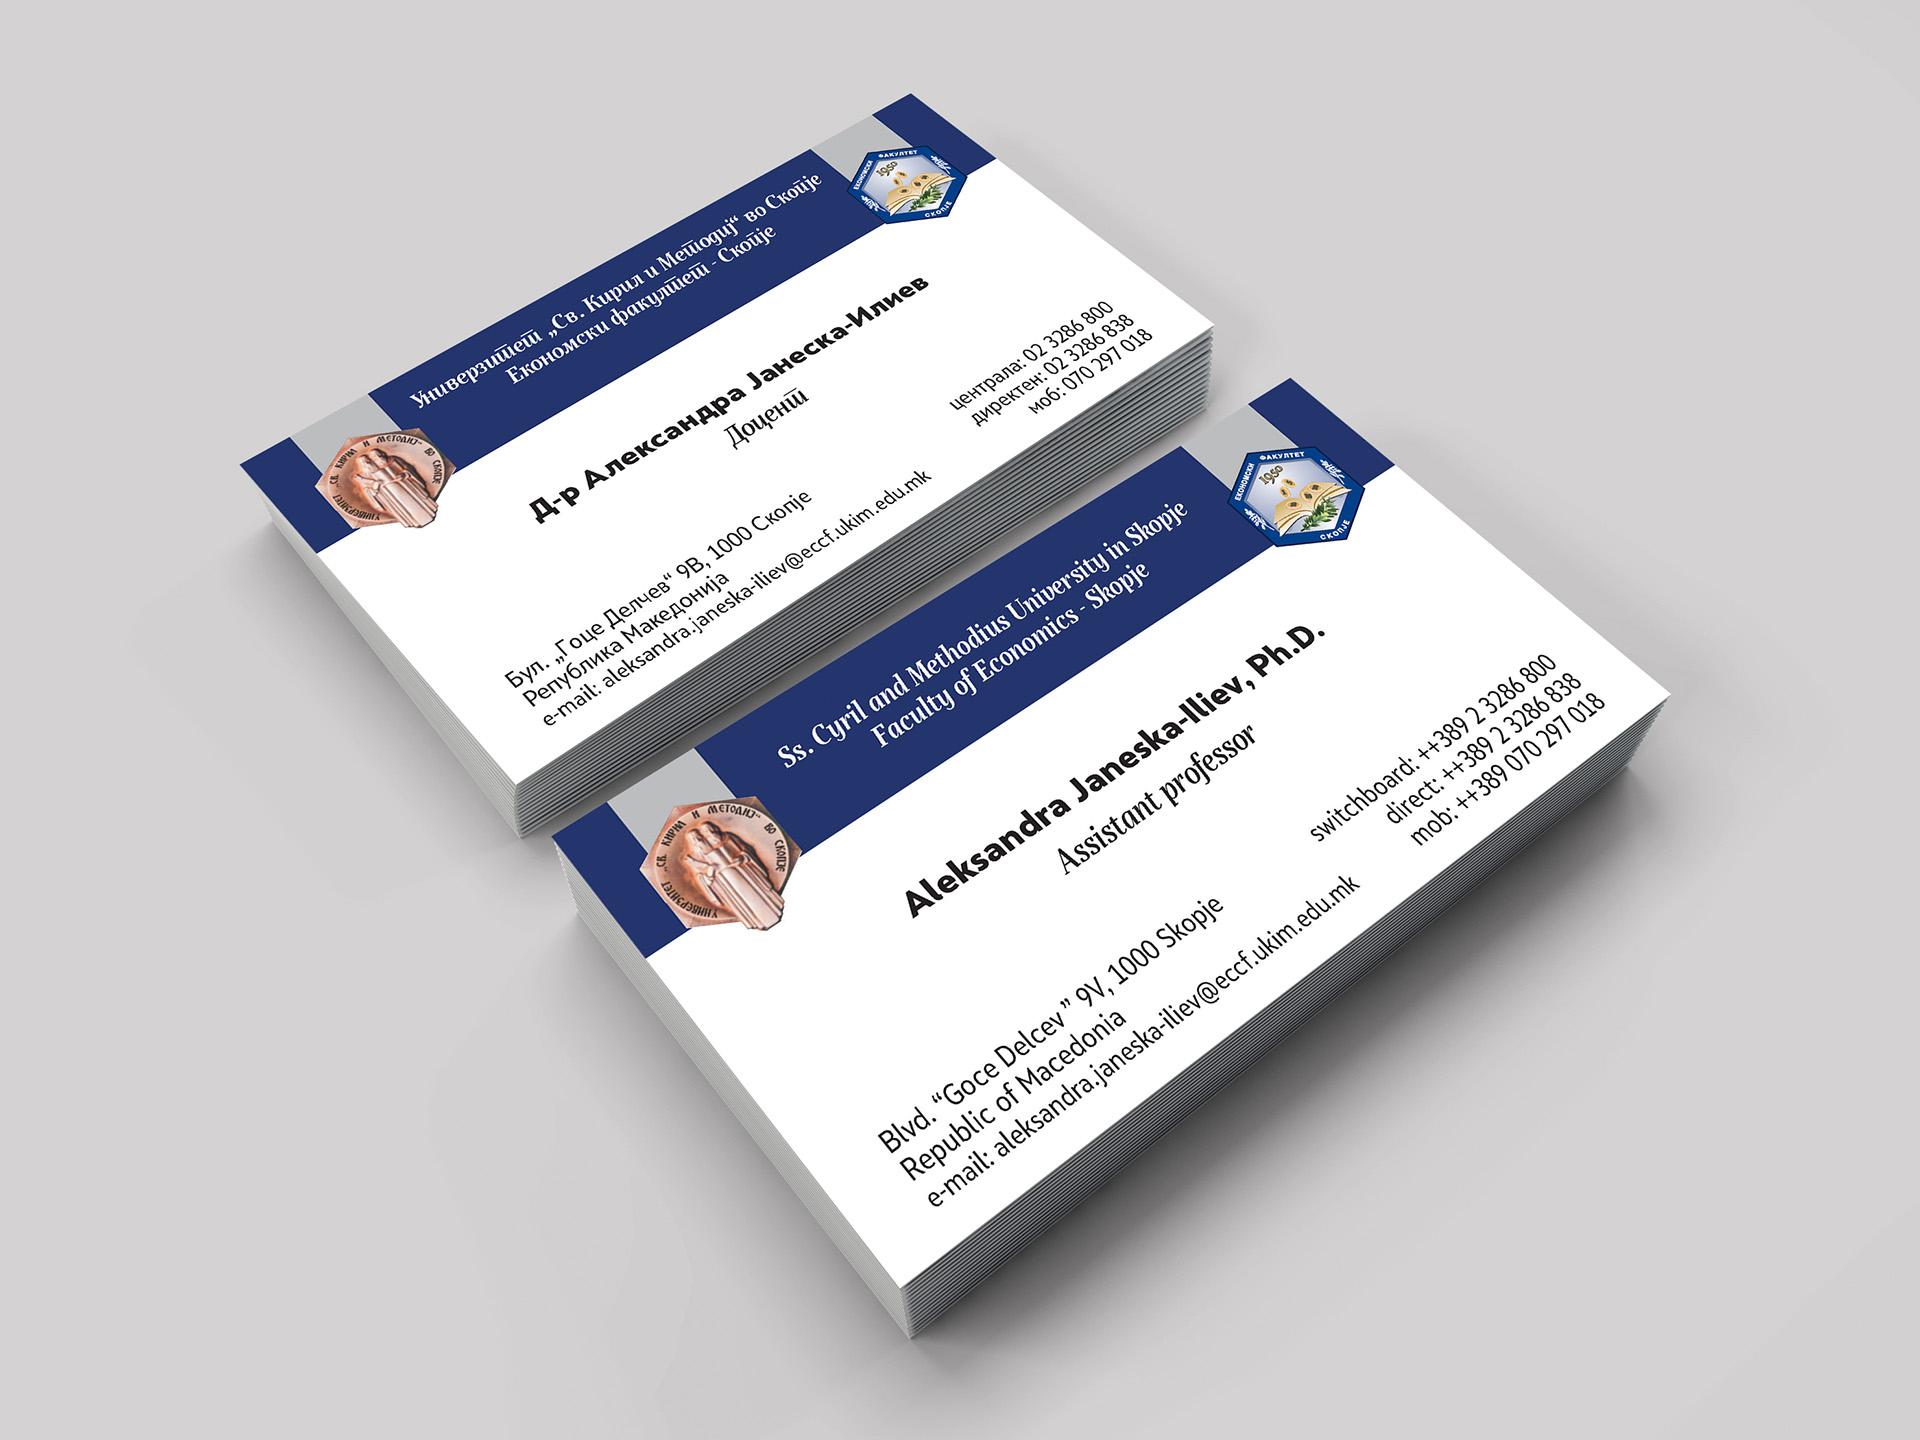 Promotion material: brochures, business cards, books, leaflets ...